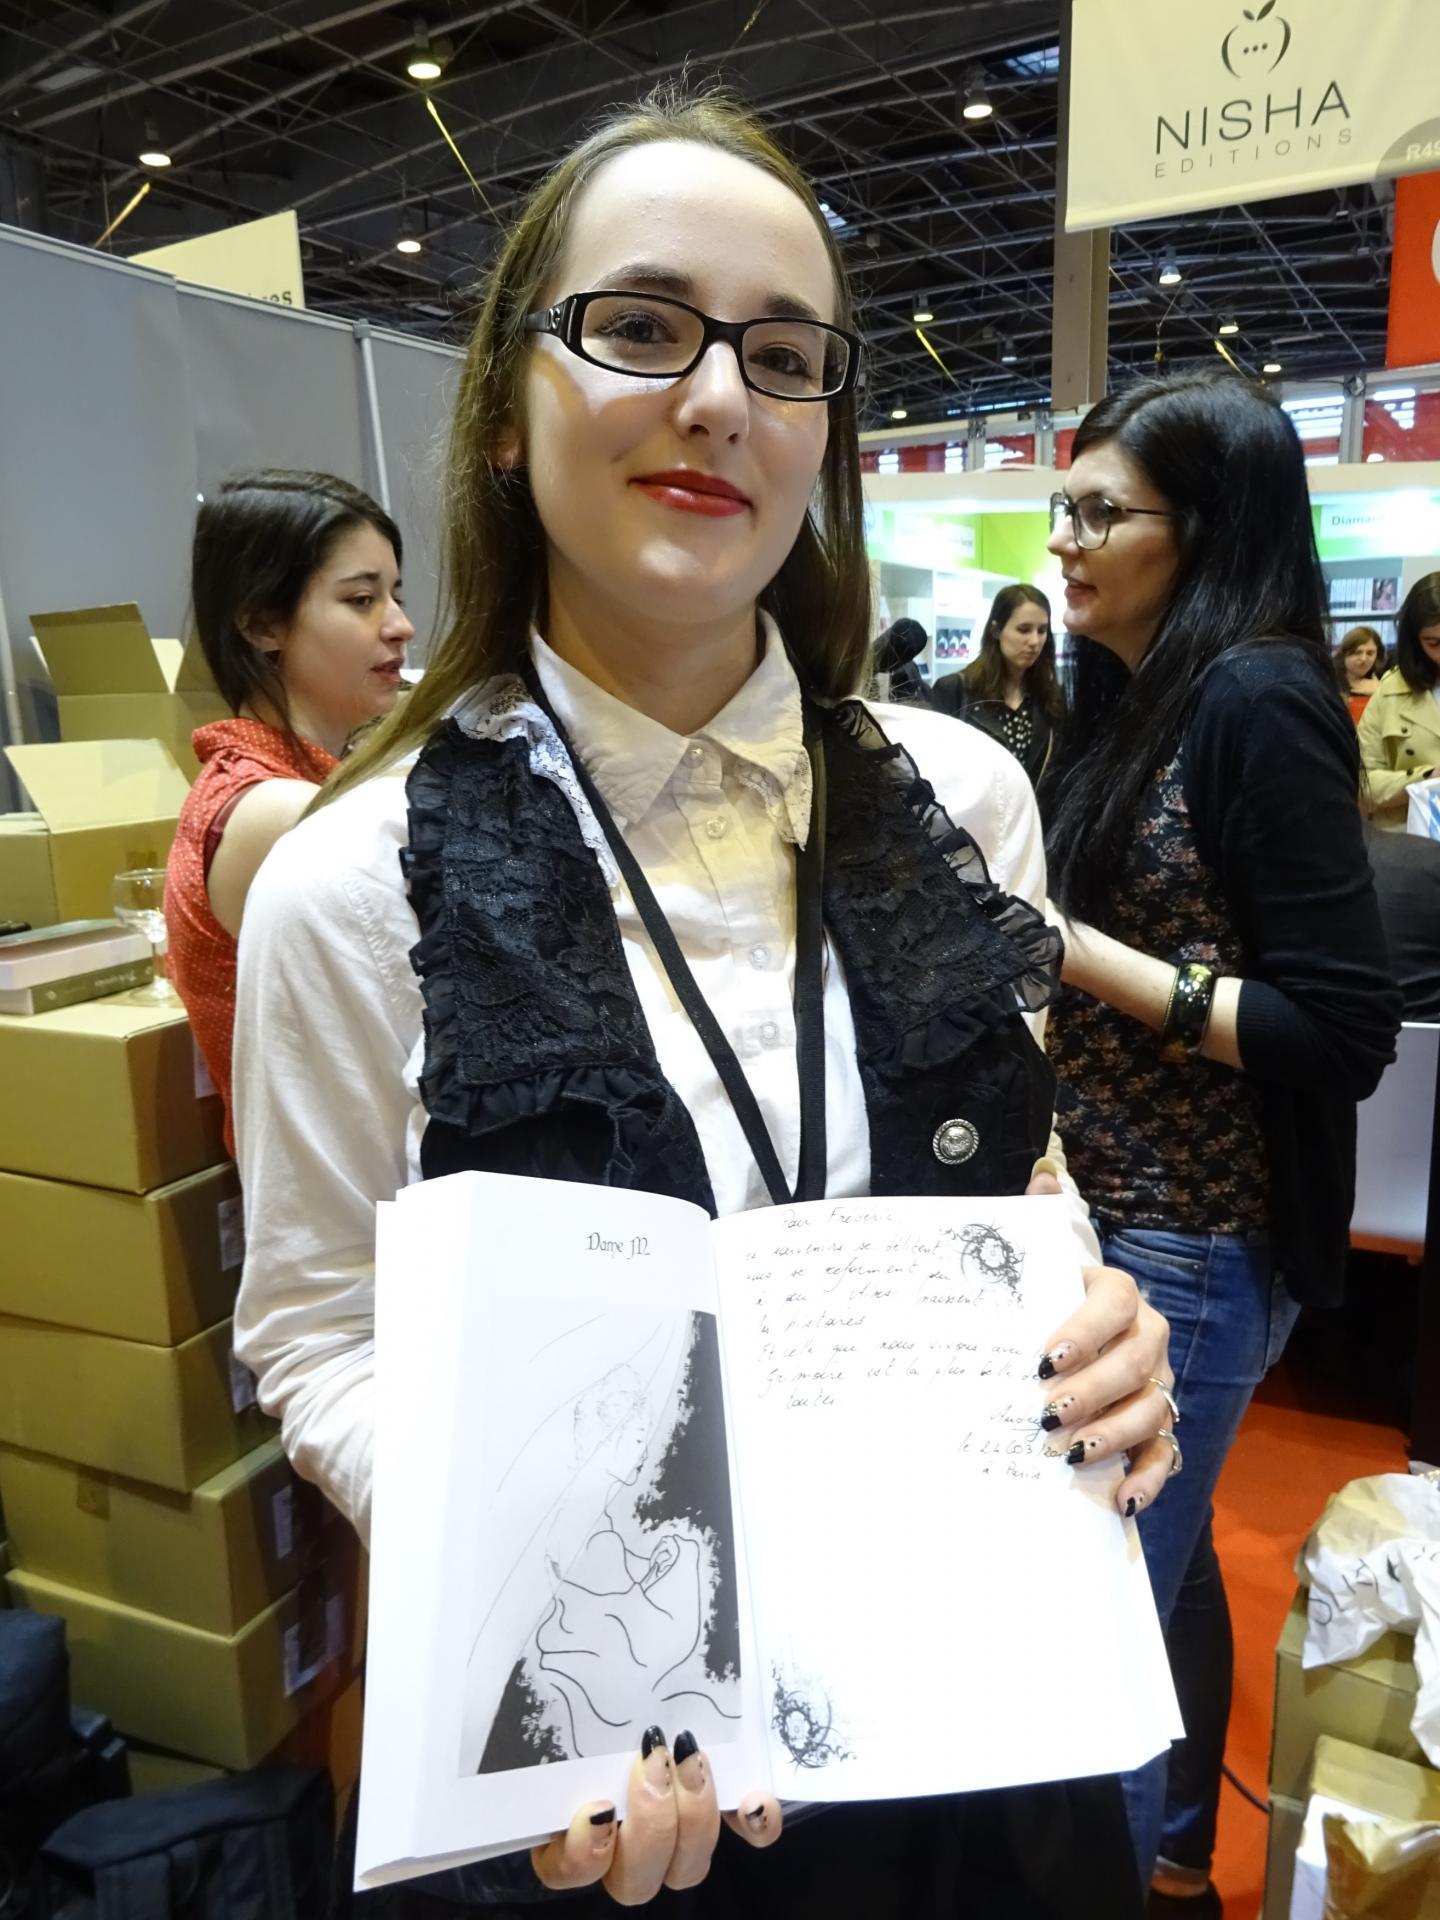 Audrey Salles, autrice